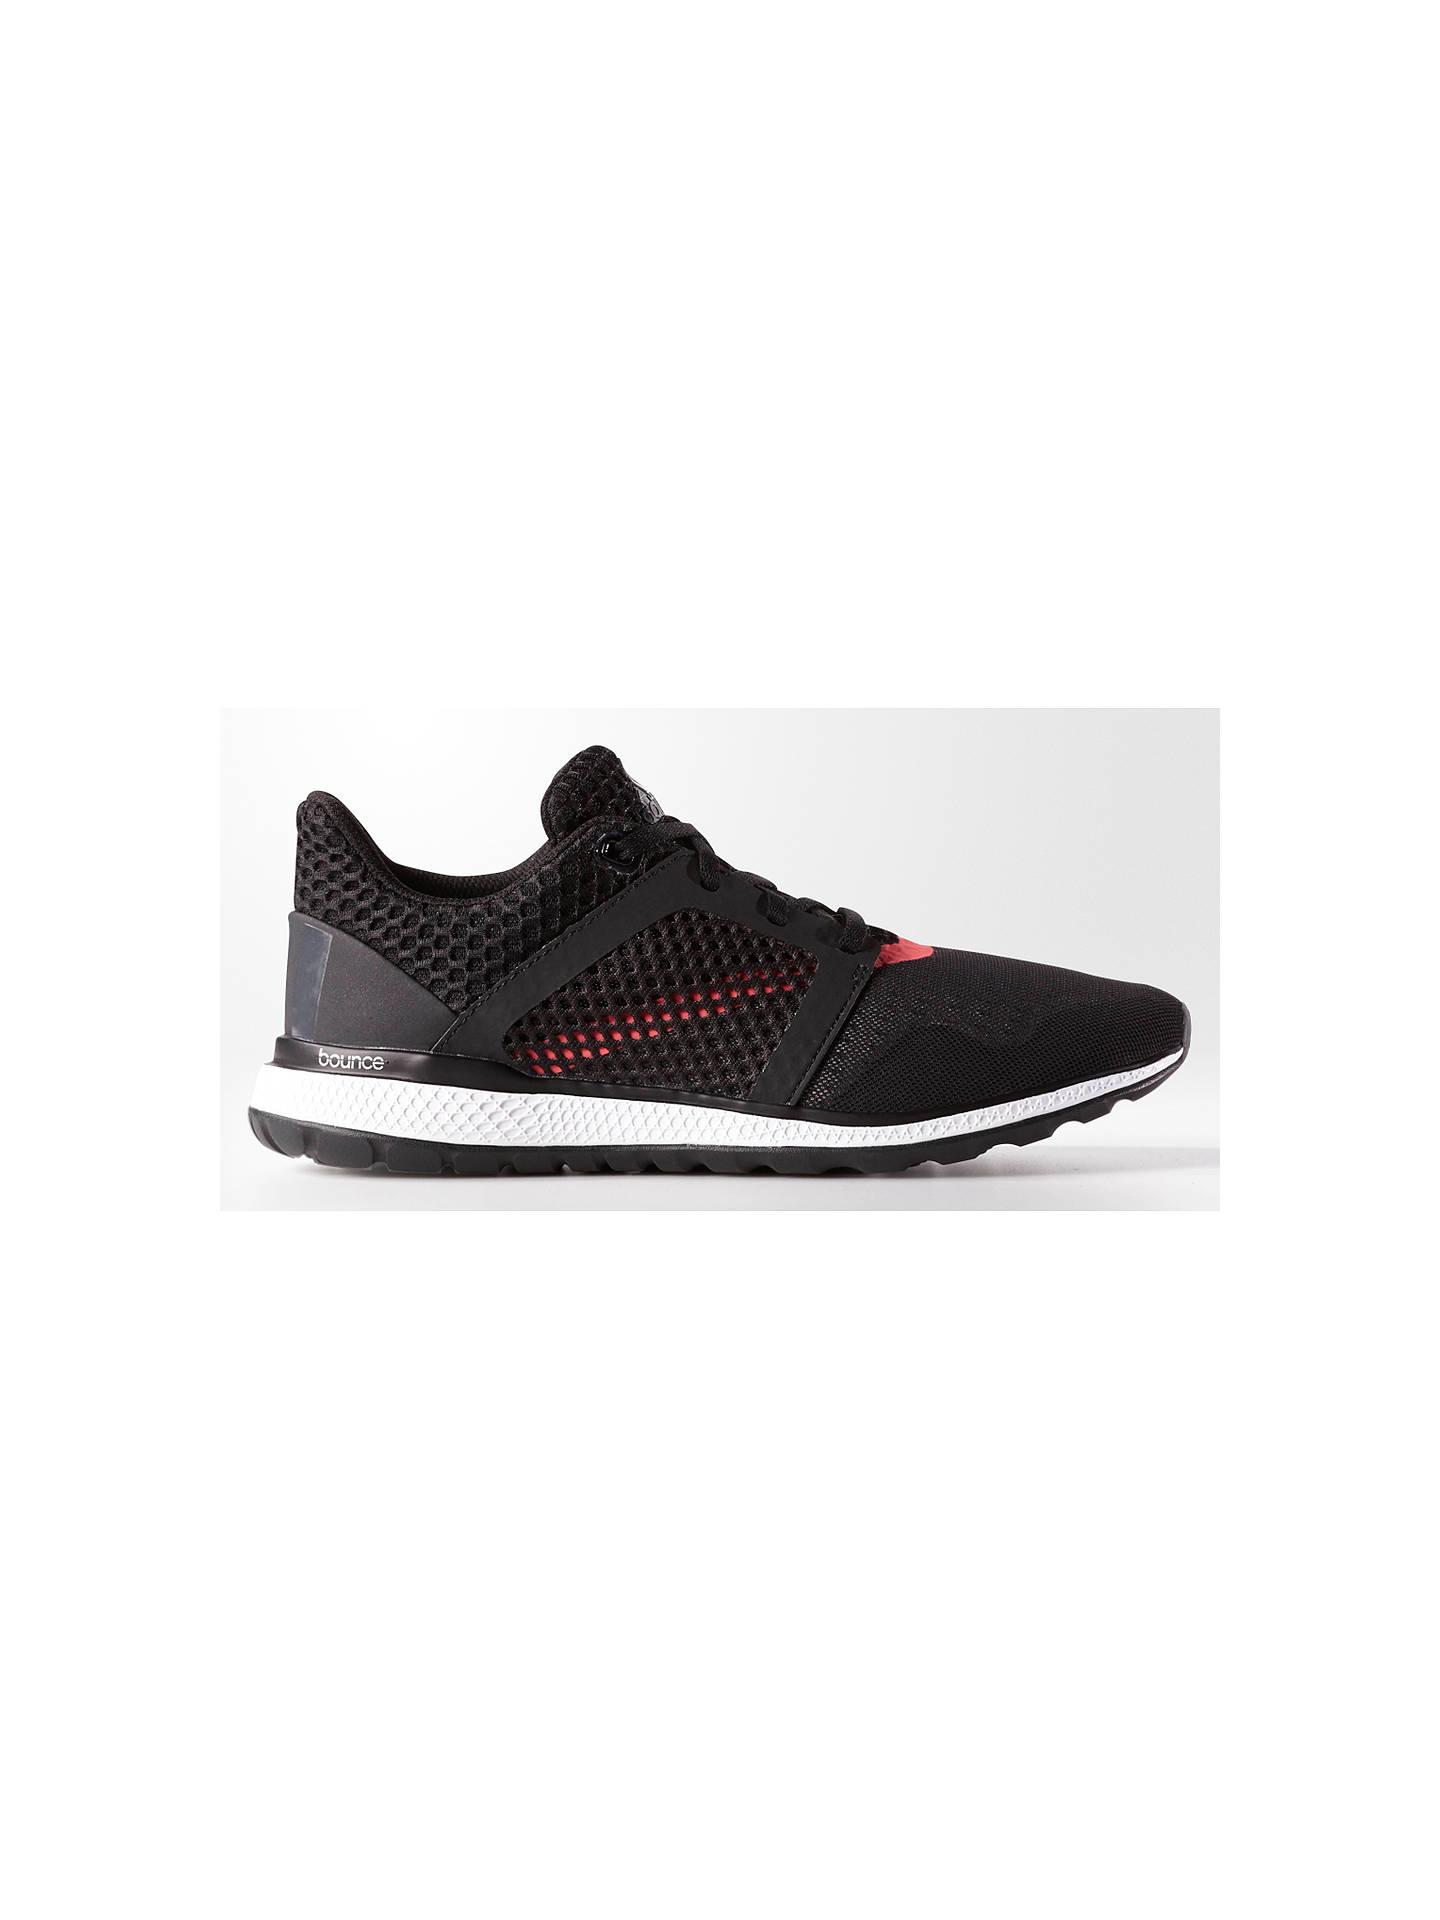 4f497fd1d Buy Adidas Energy Bounce 2.0 Women s Running Shoes